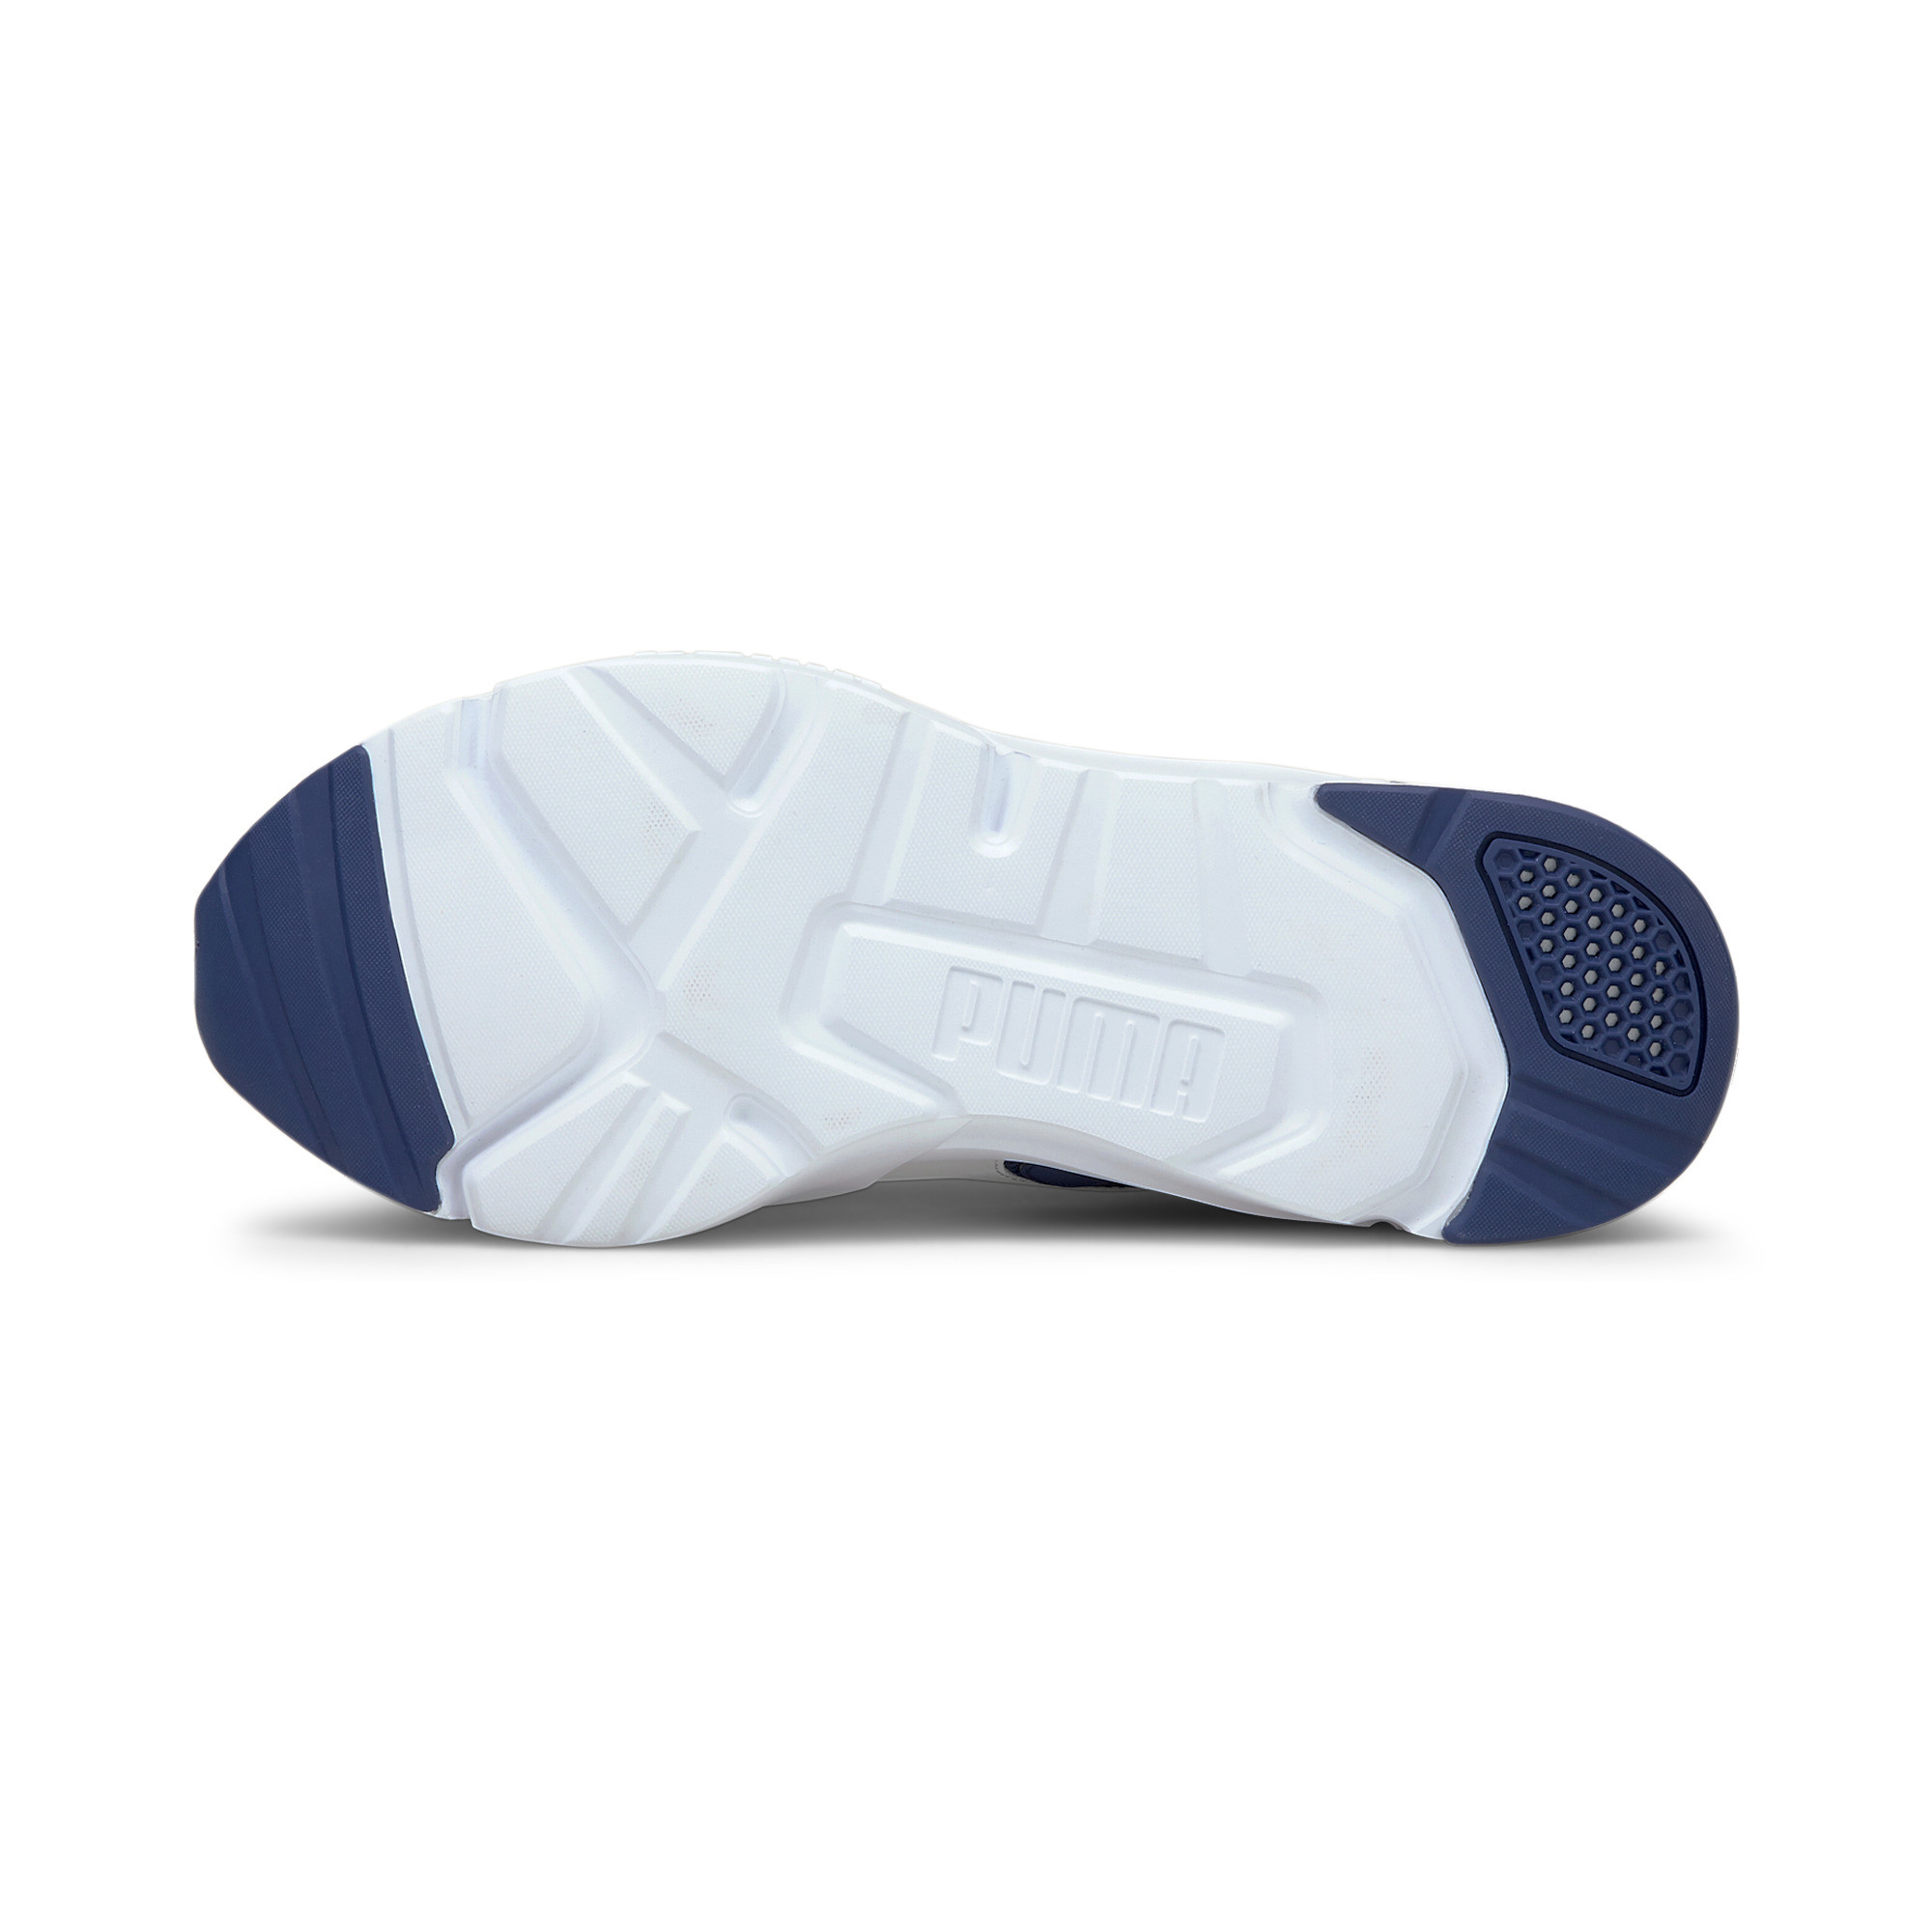 thumbnail 16 - PUMA Men's CELL Pharos Training Shoes